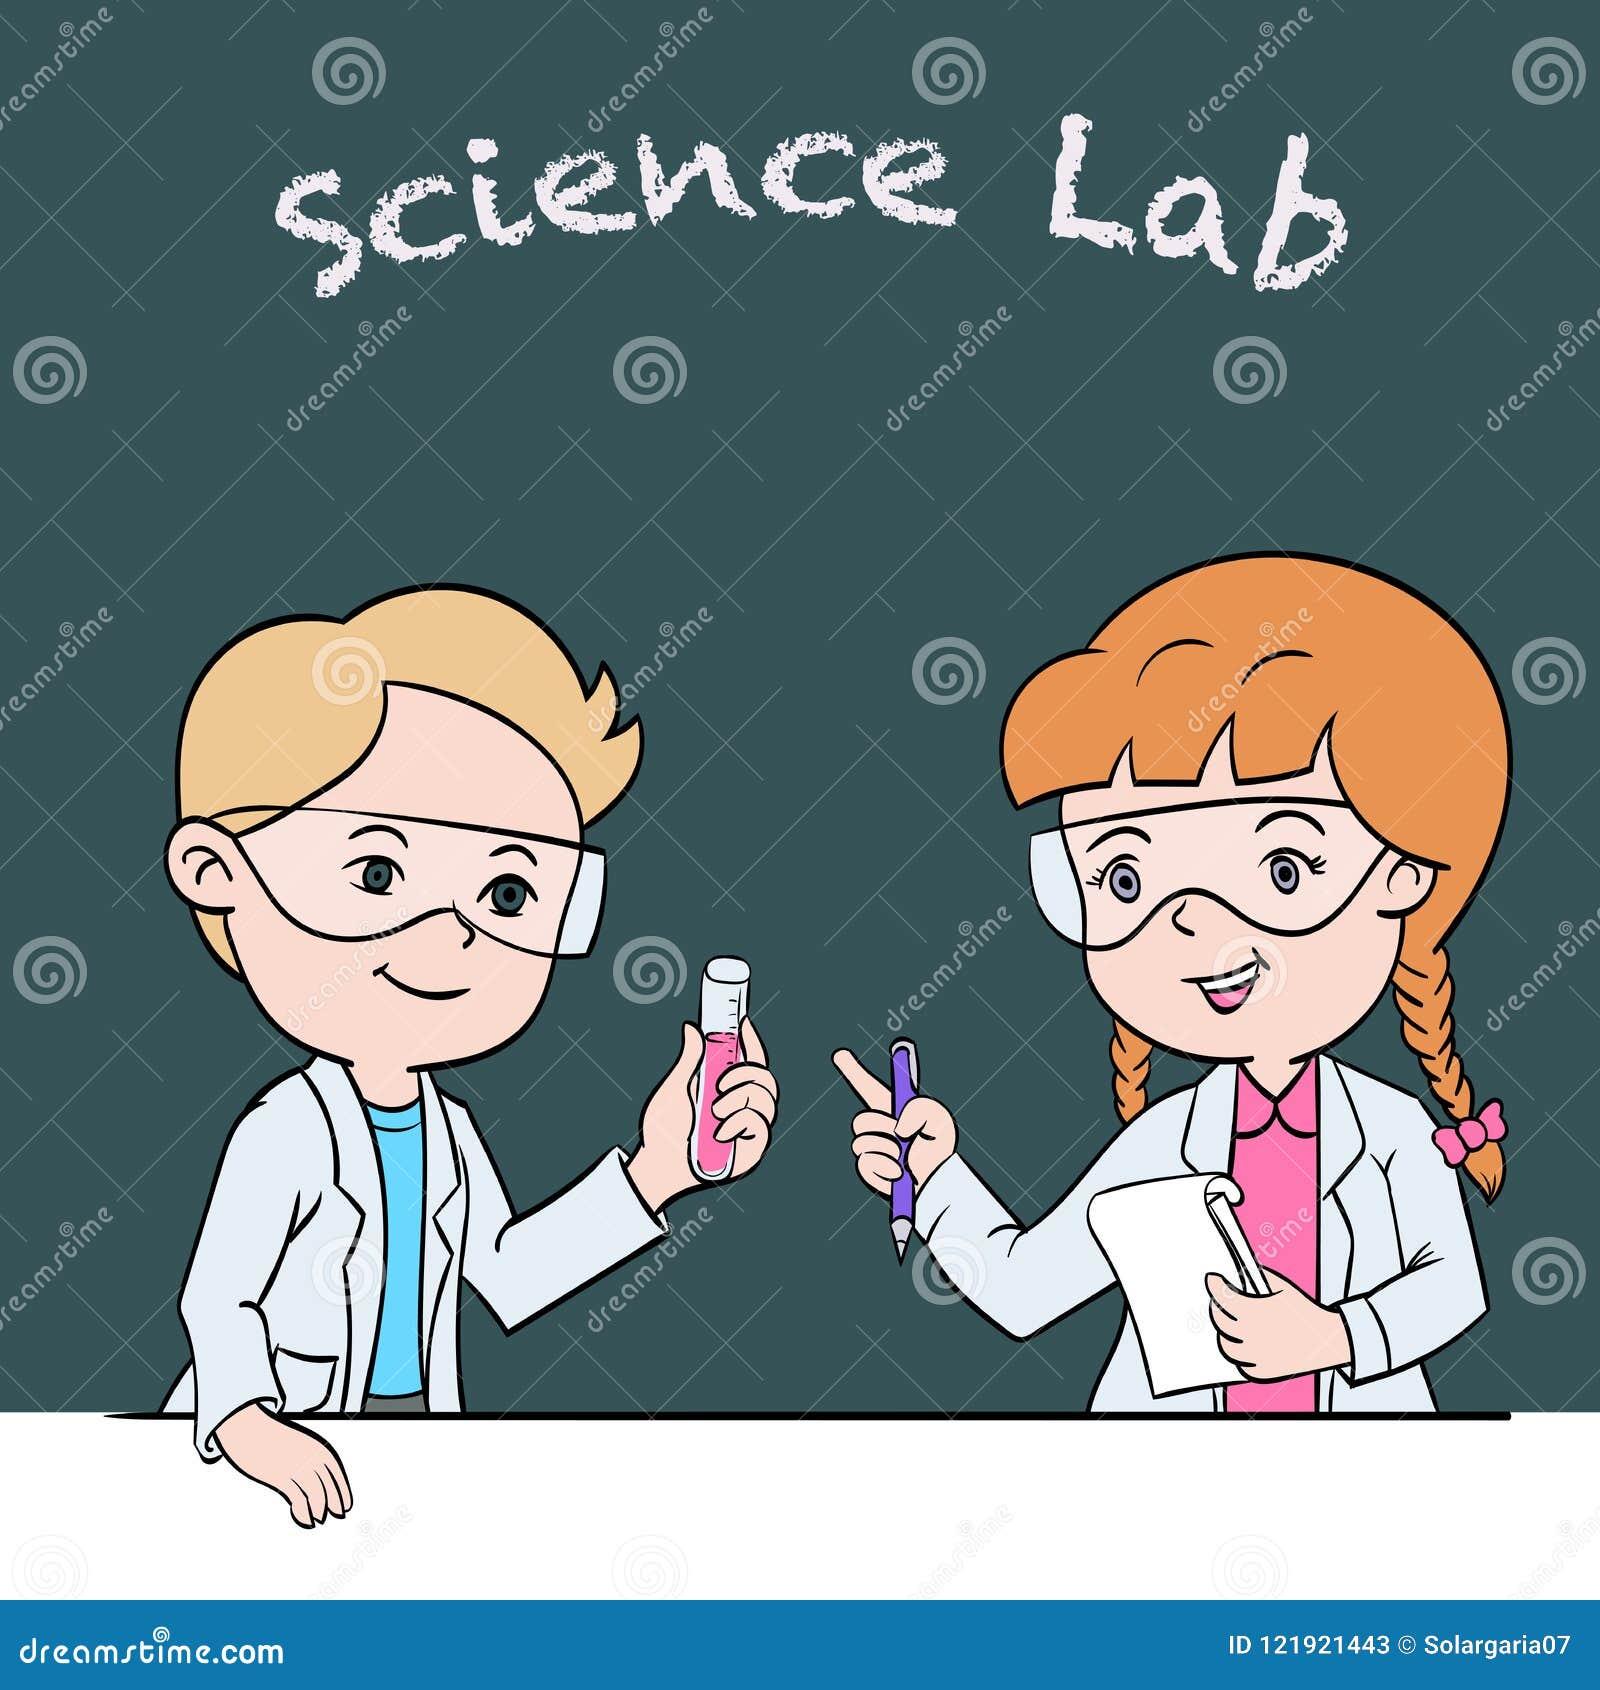 Kids in science lab class - Cartoon Vector Illustration